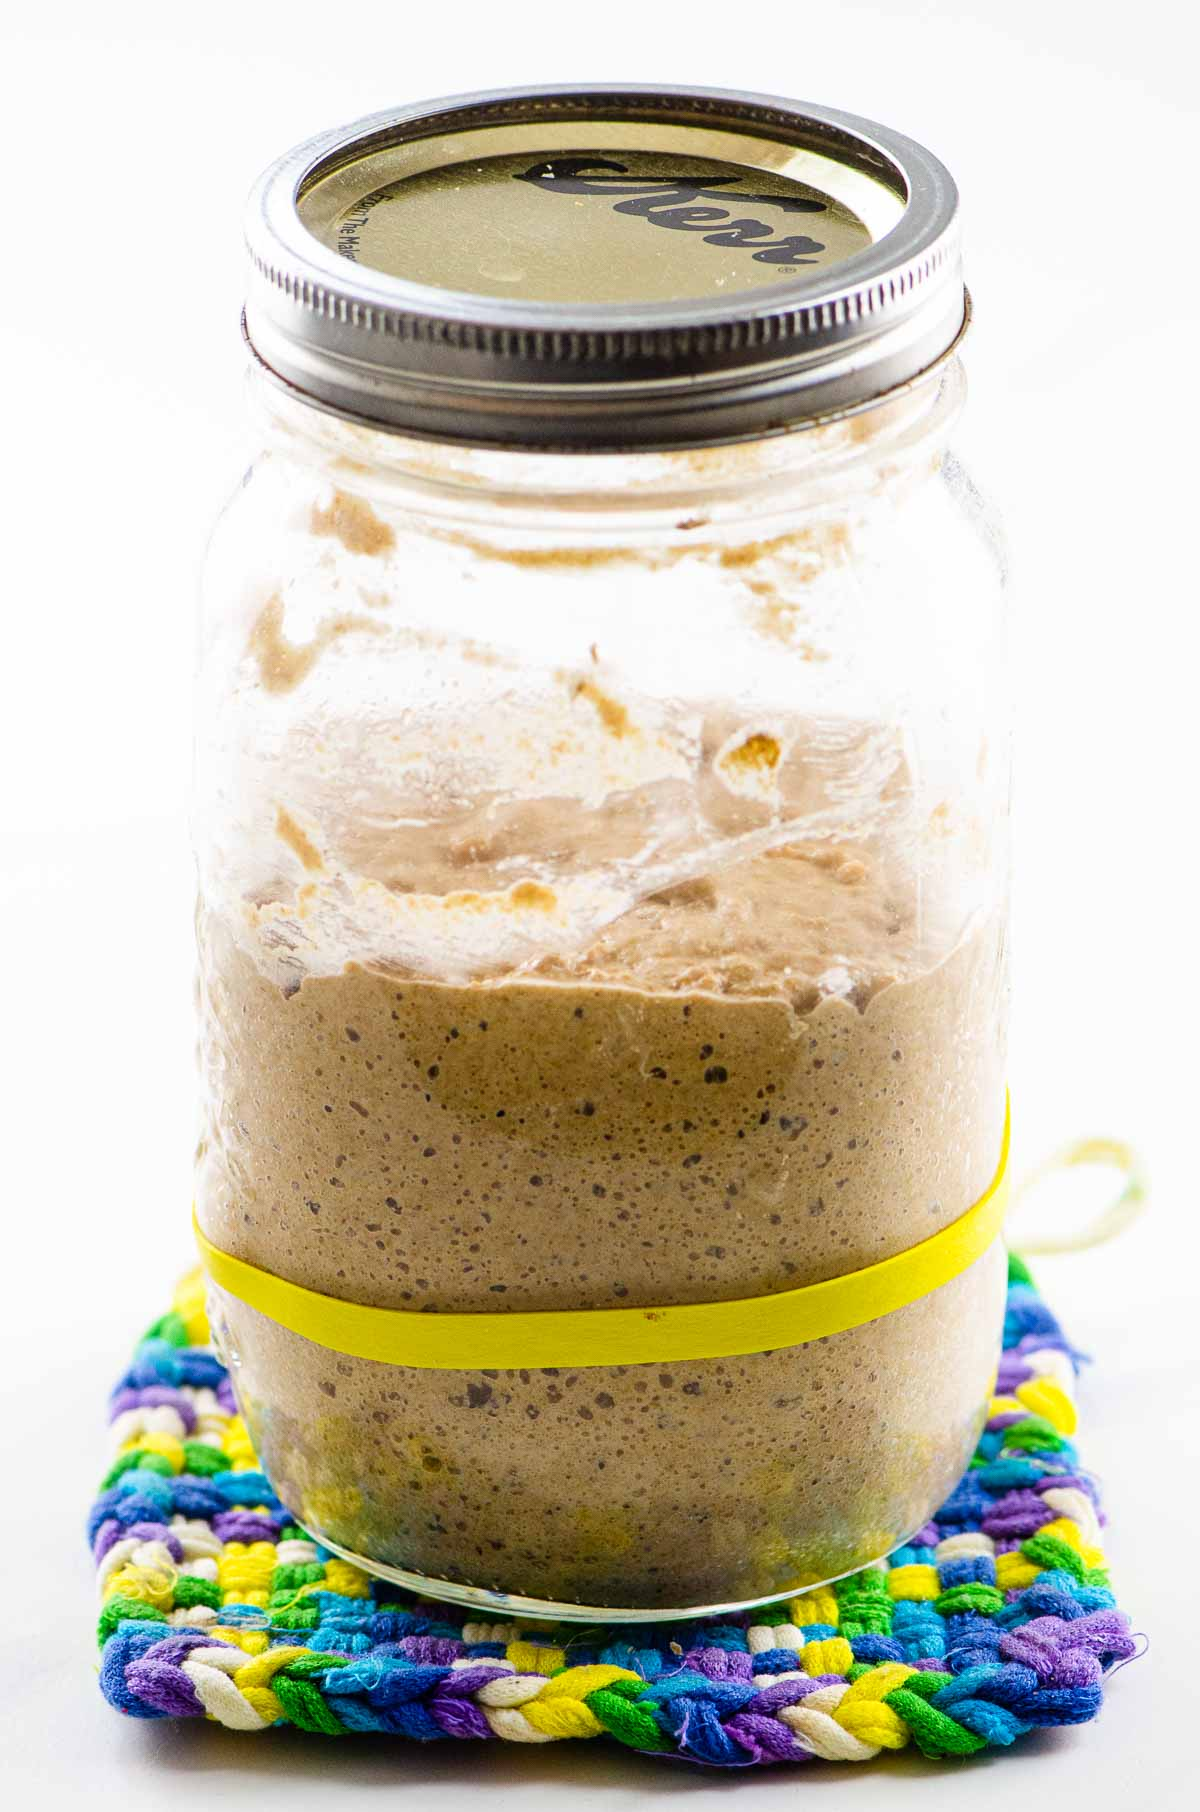 mature rye sourdough starter from day 5 on a trivet